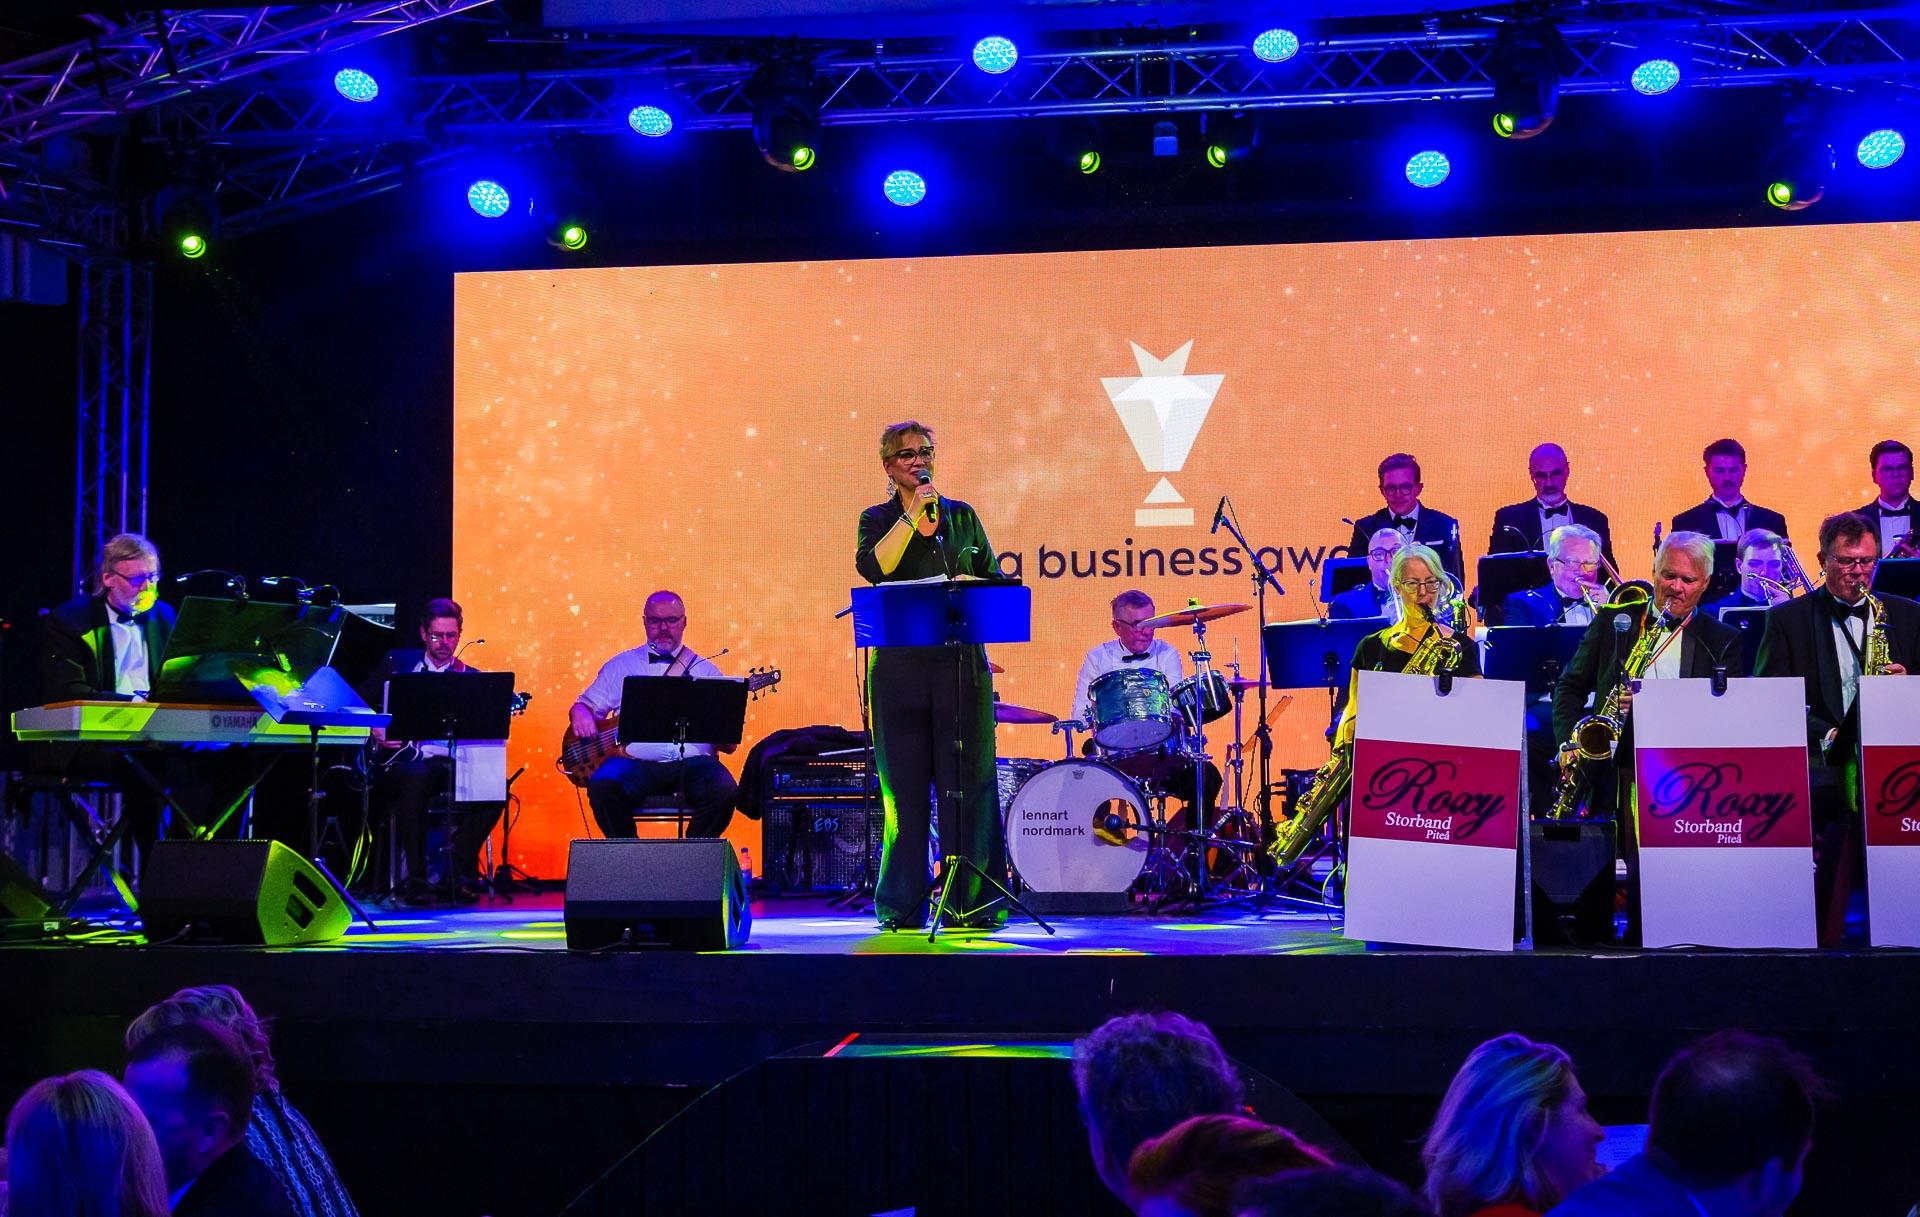 Roxy storband samt Kicki Enqvist på scenen 2019